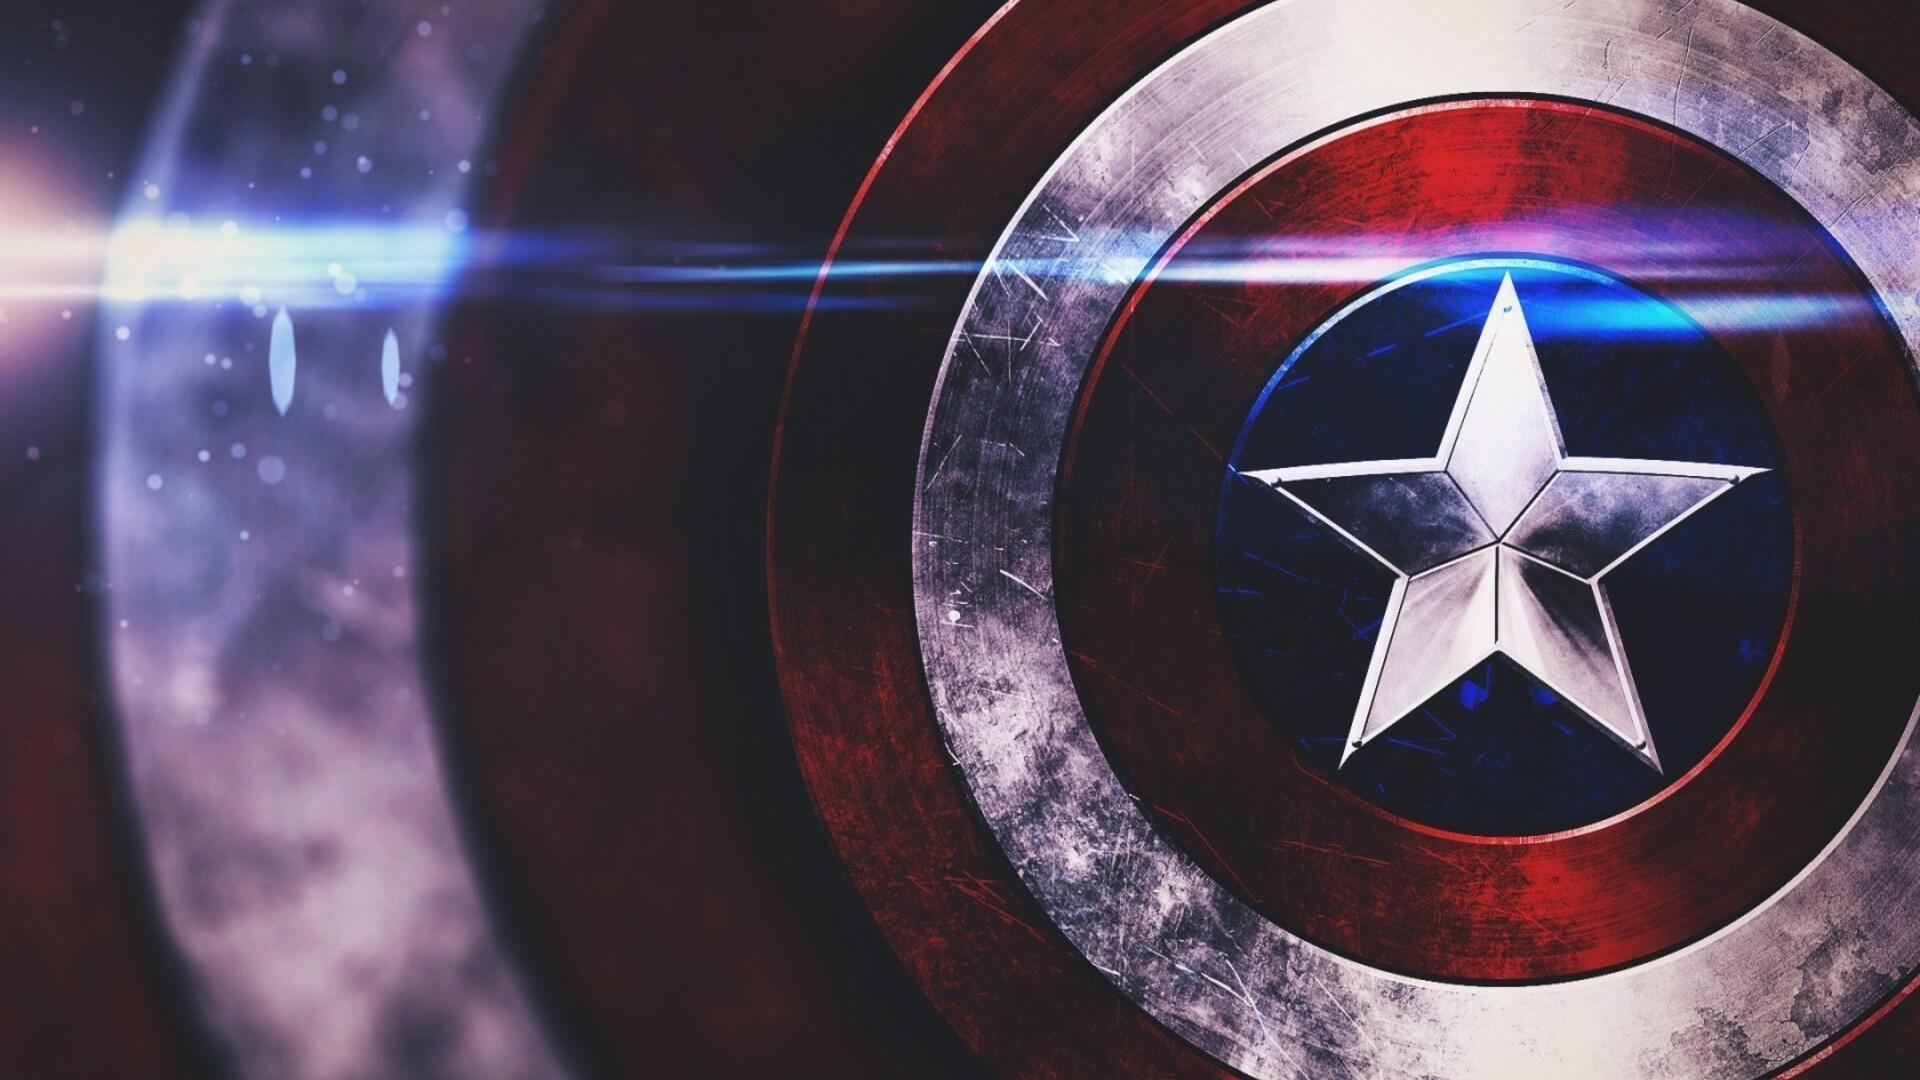 1920x1080 Captain America Shield Laptop Full Hd 1080p Hd 4k